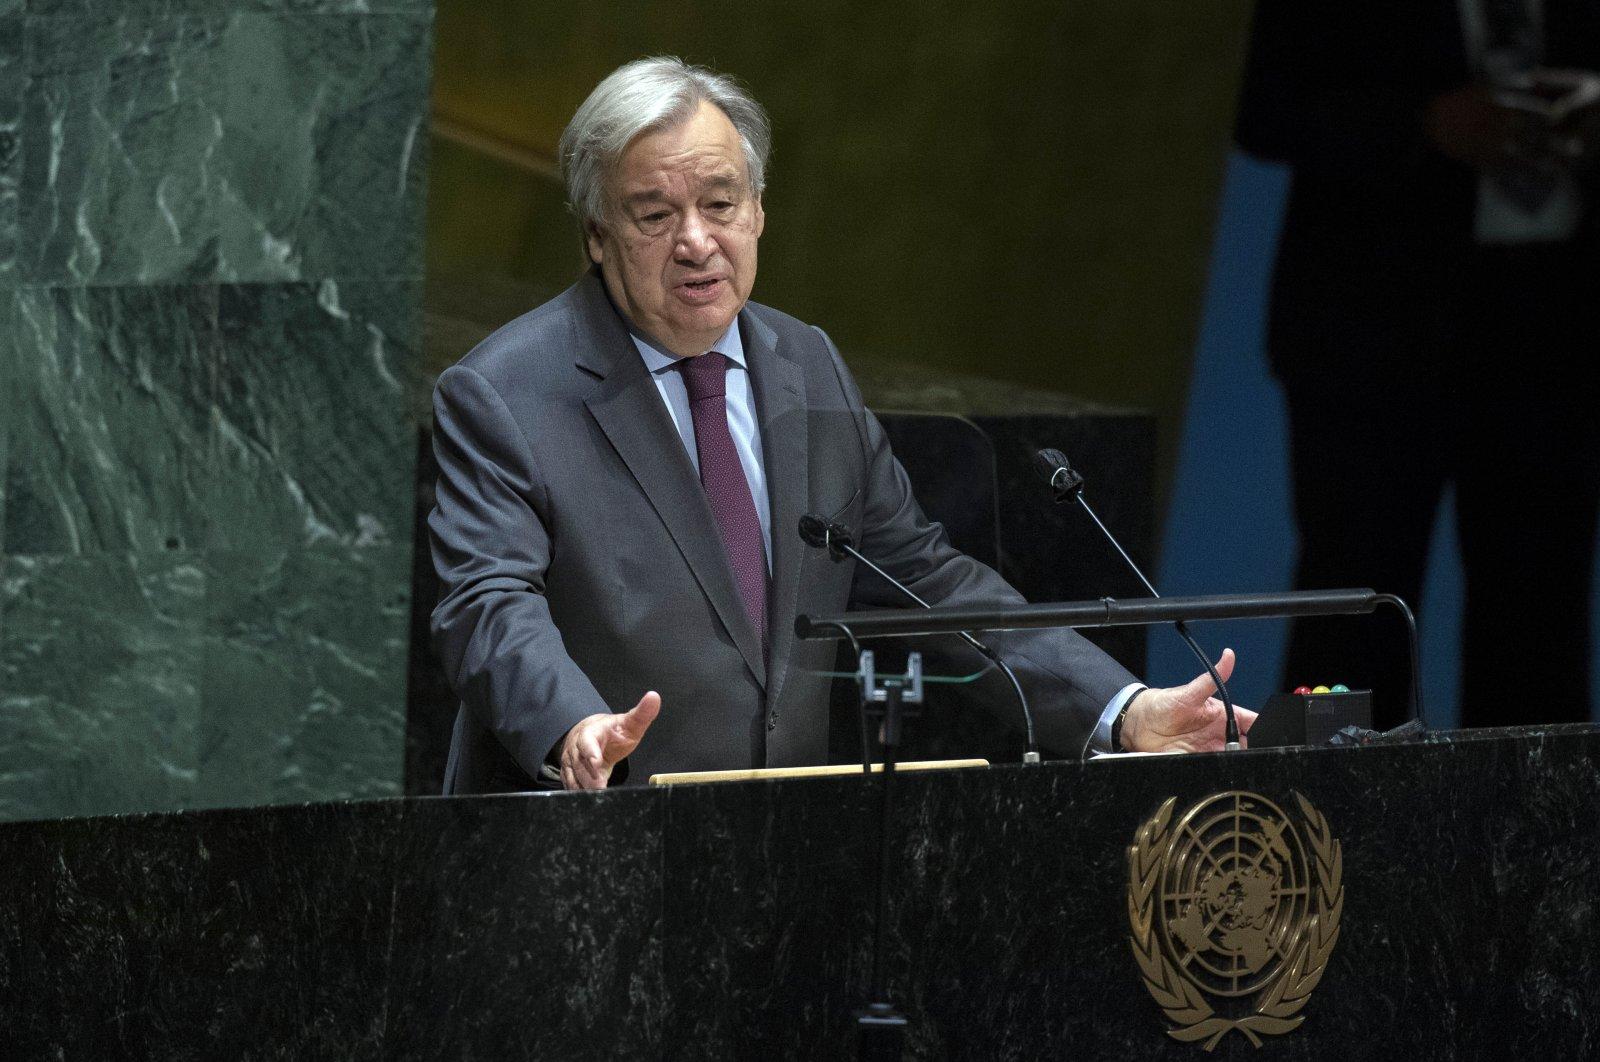 United Nations Secretary-General Antonio Guterres speaks in the U.N. General Assembly in New York City, New York, U.S., Oct. 1, 2020. (AP Photo)